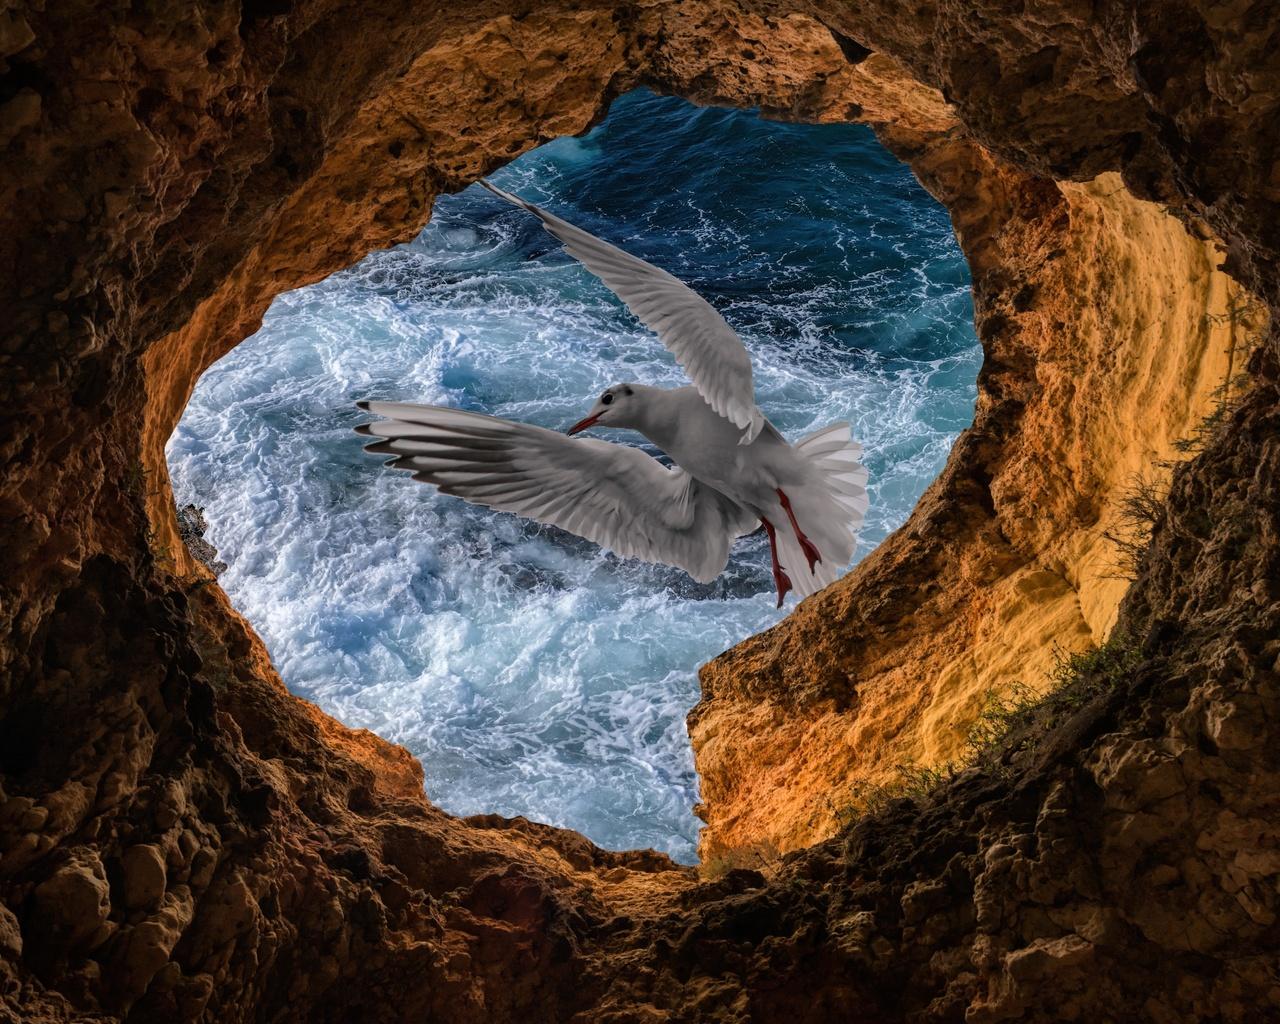 чайка, скалы, волны